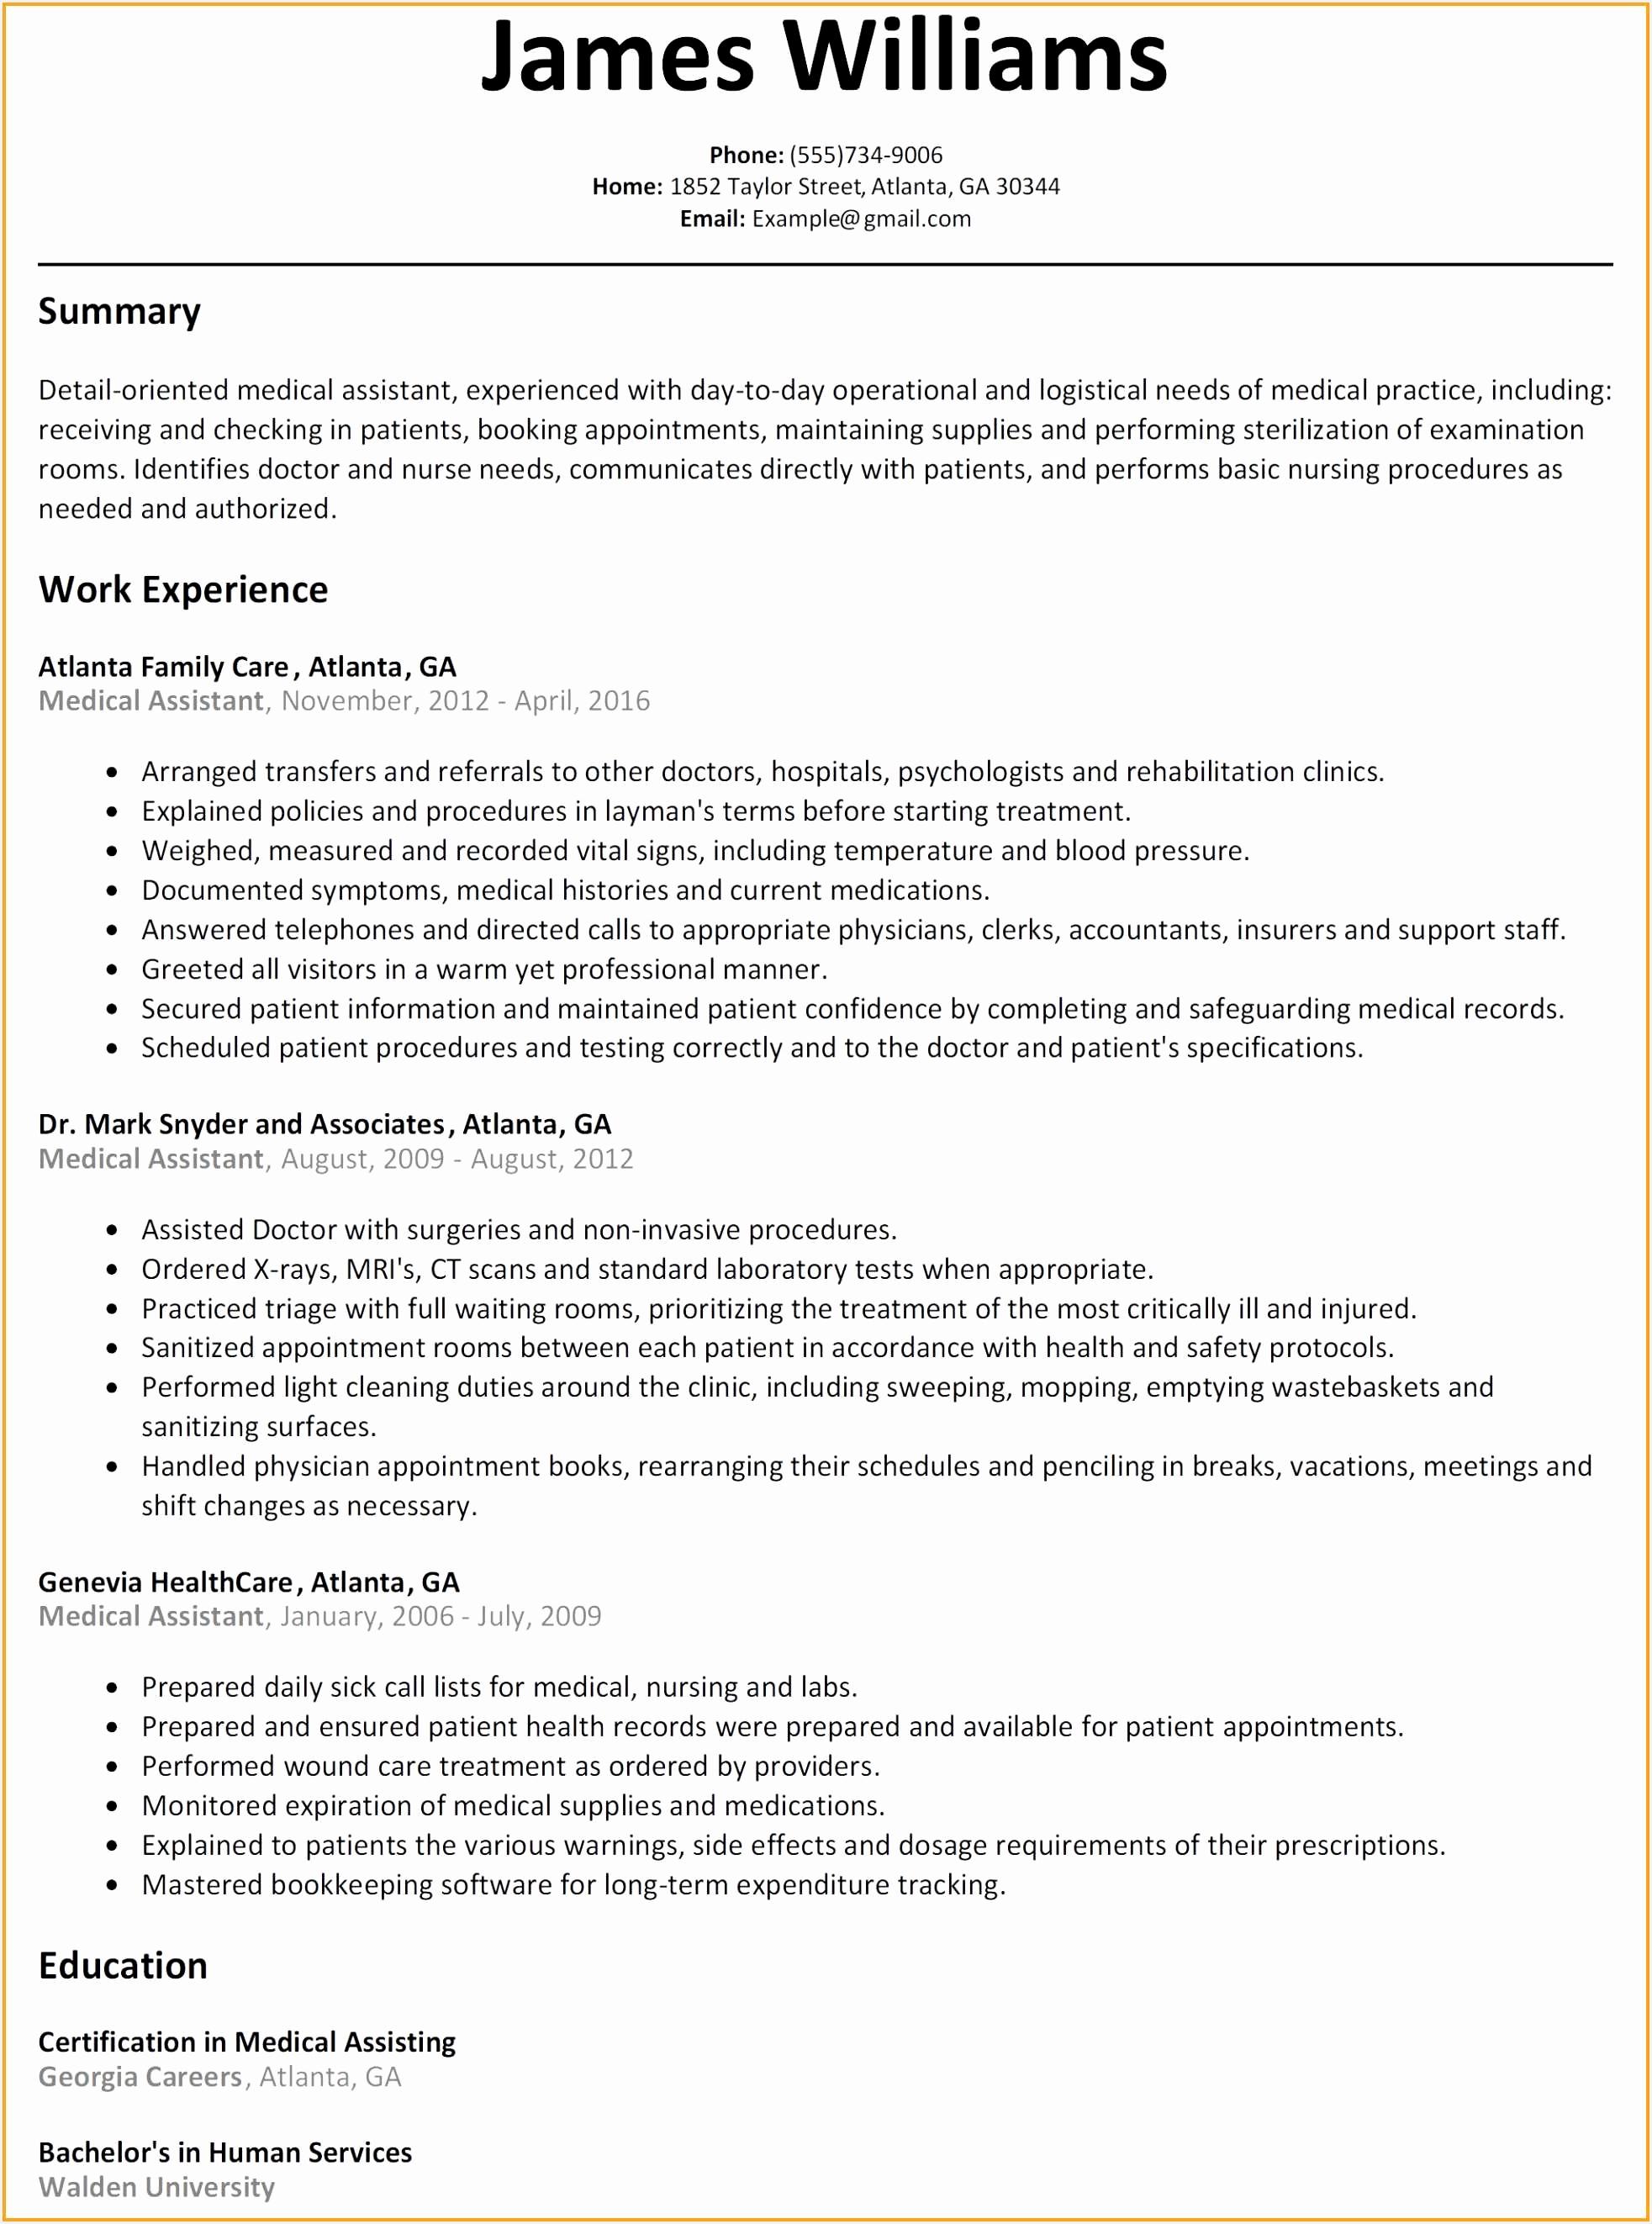 Microsoft Word Template Resume Resume Template Ms Word Luxury Resume Template Free Word New Od26451965